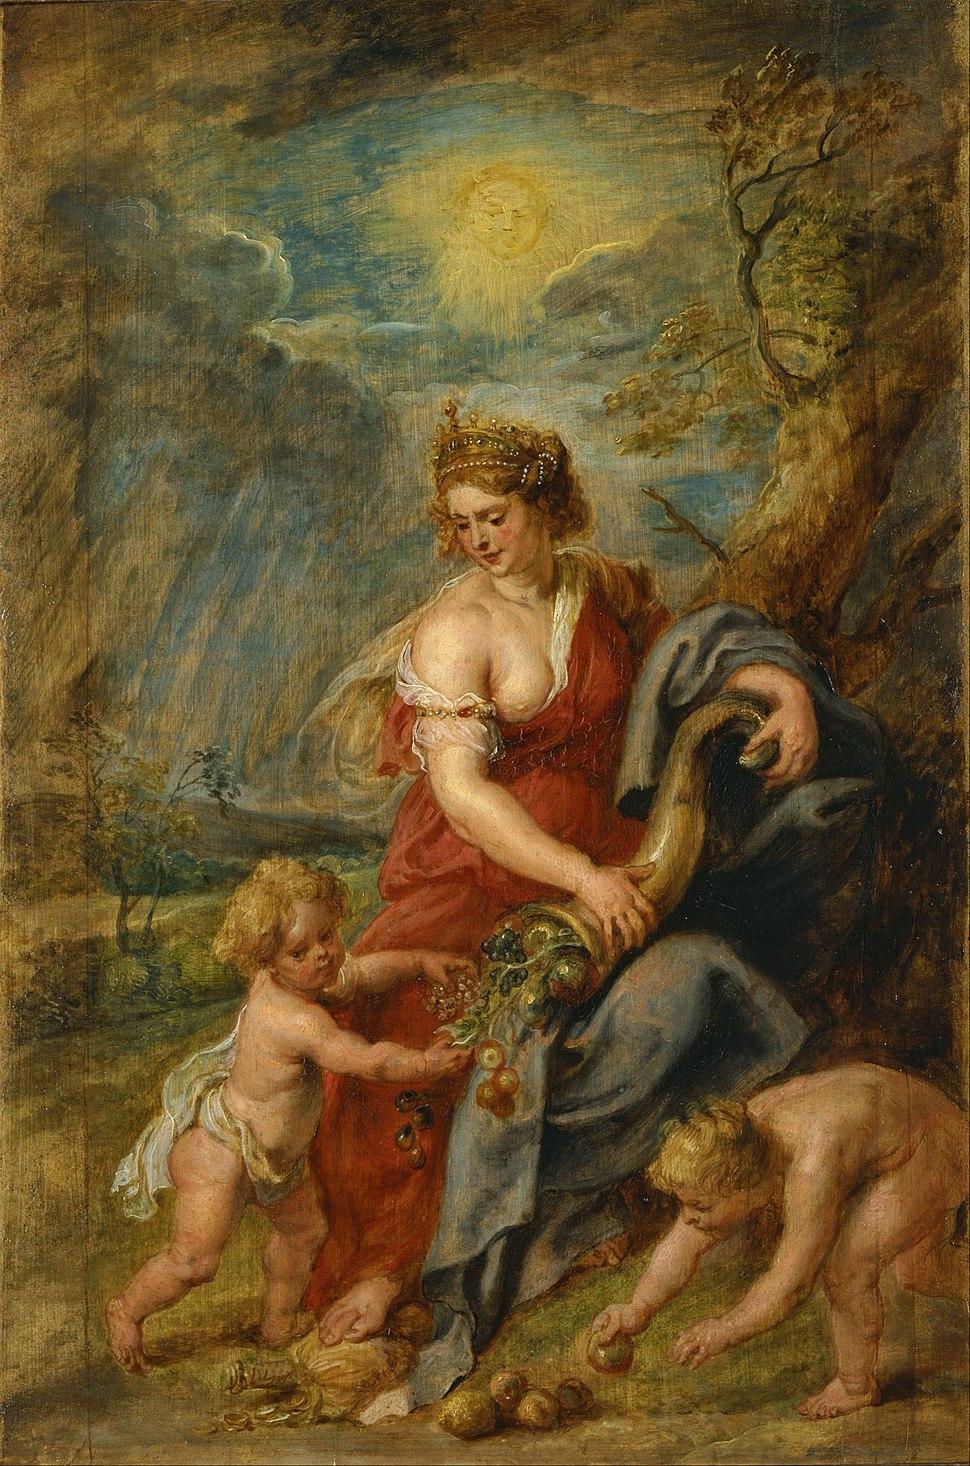 Peter Paul Rubens - Abundance (Abundantia) - Google Art Project